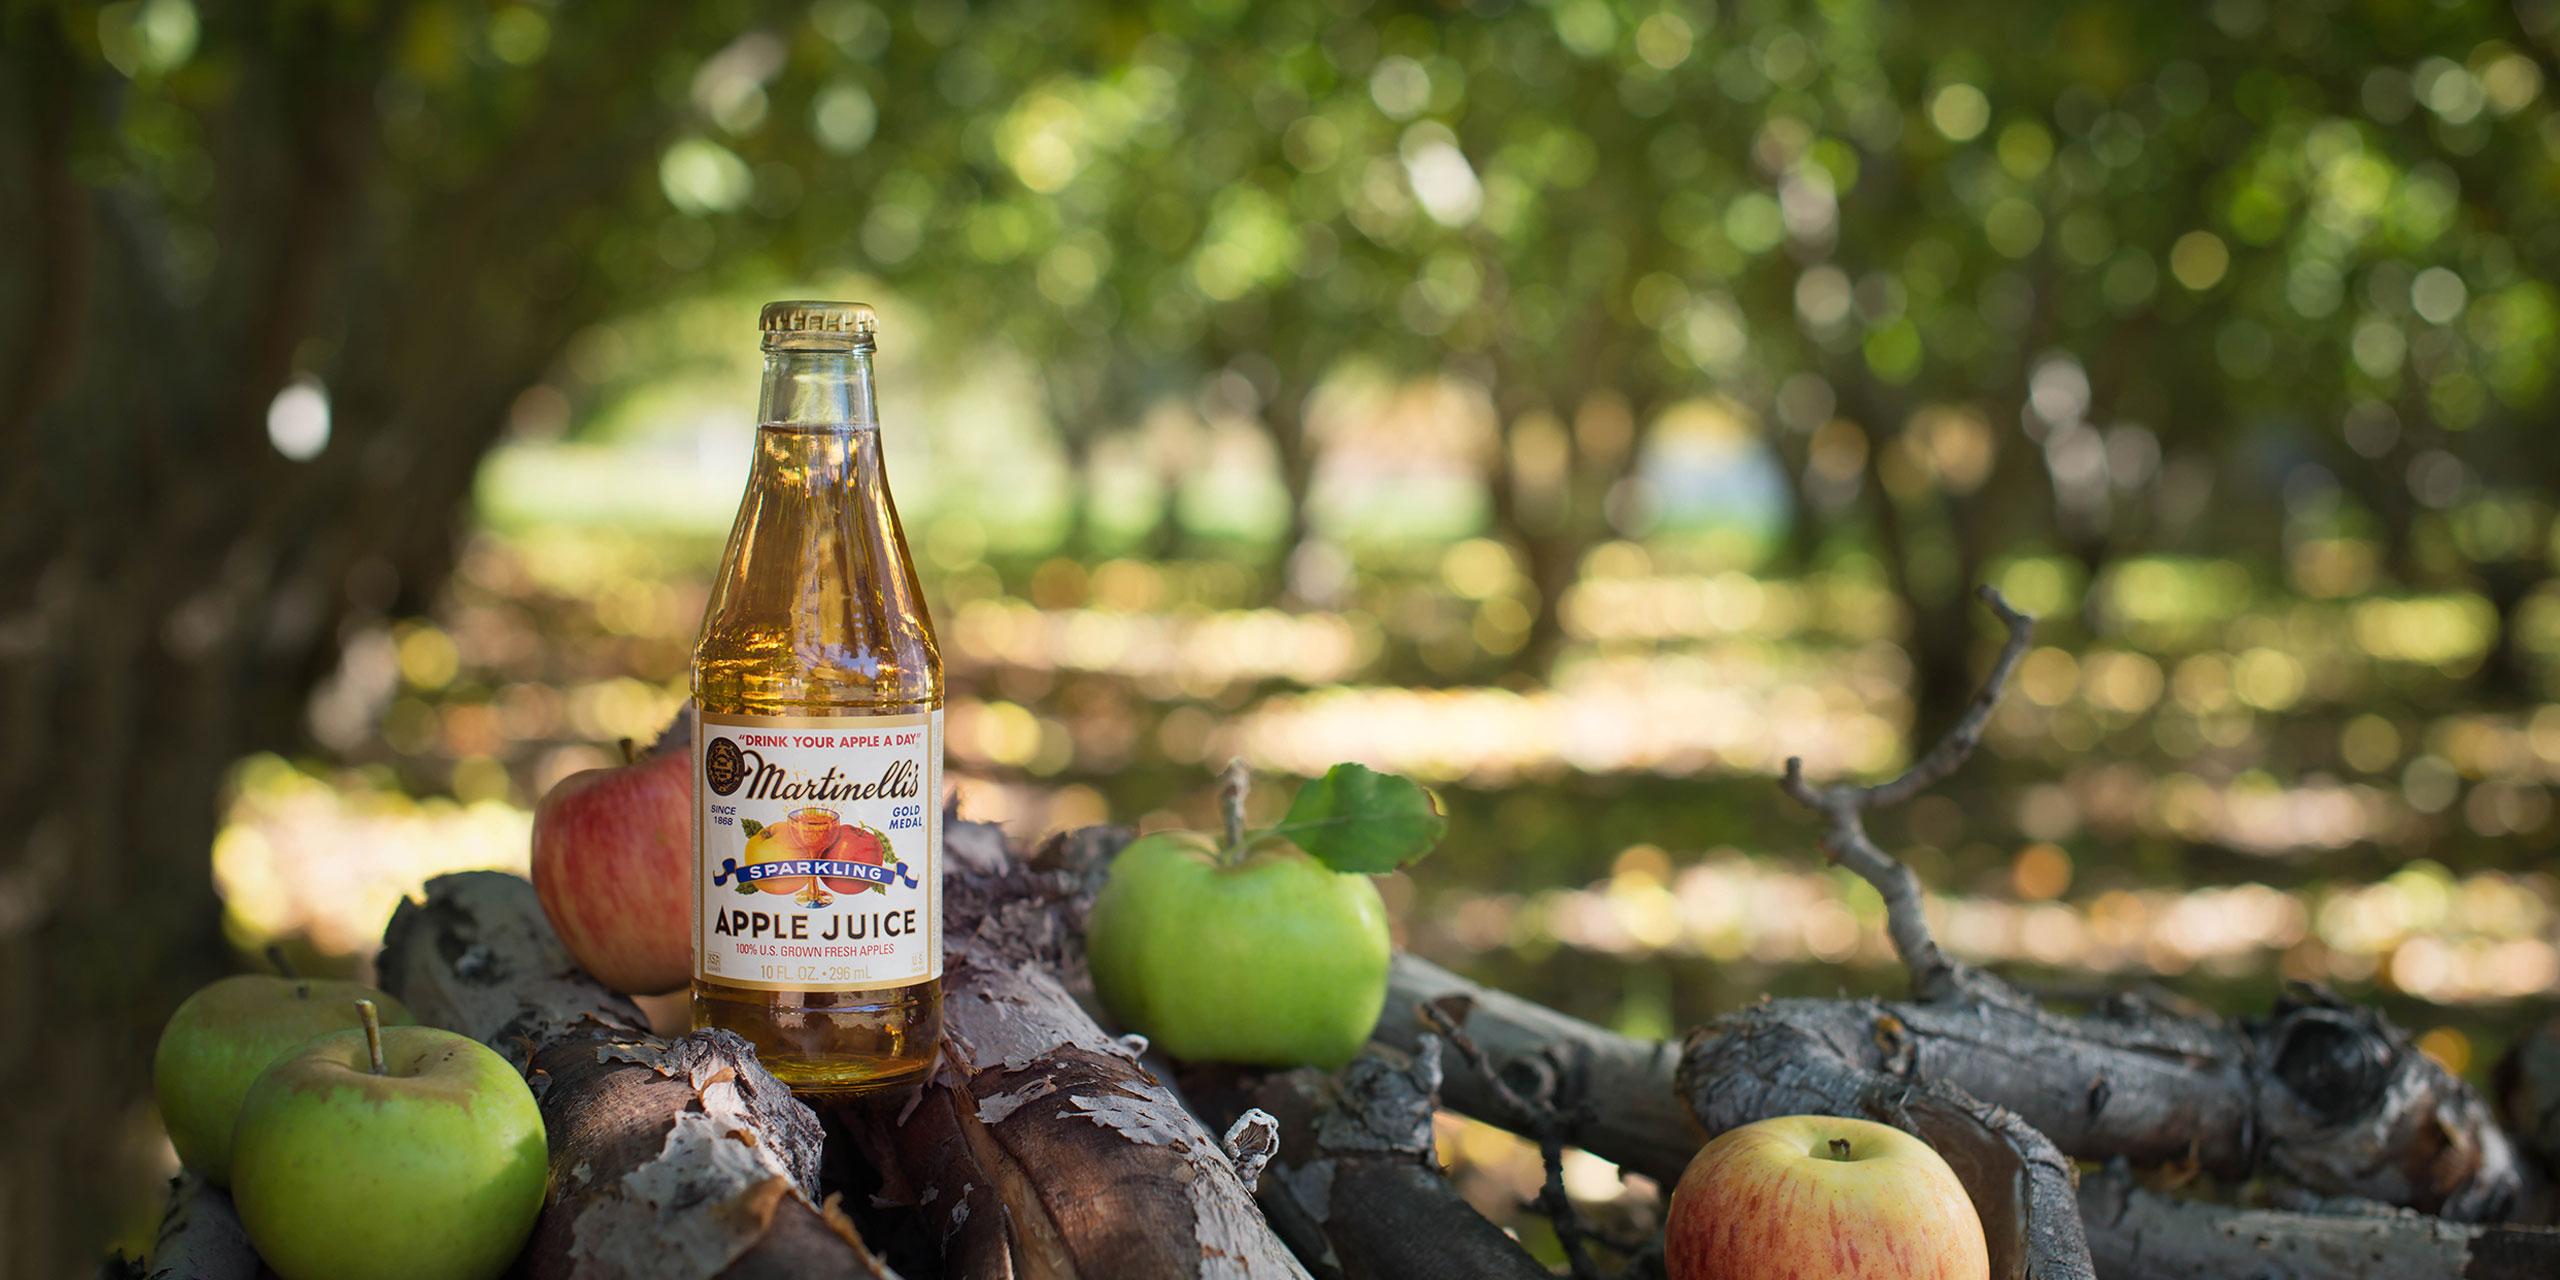 Sparkling Apple Juice Sparkling Juices S Martinelli Co